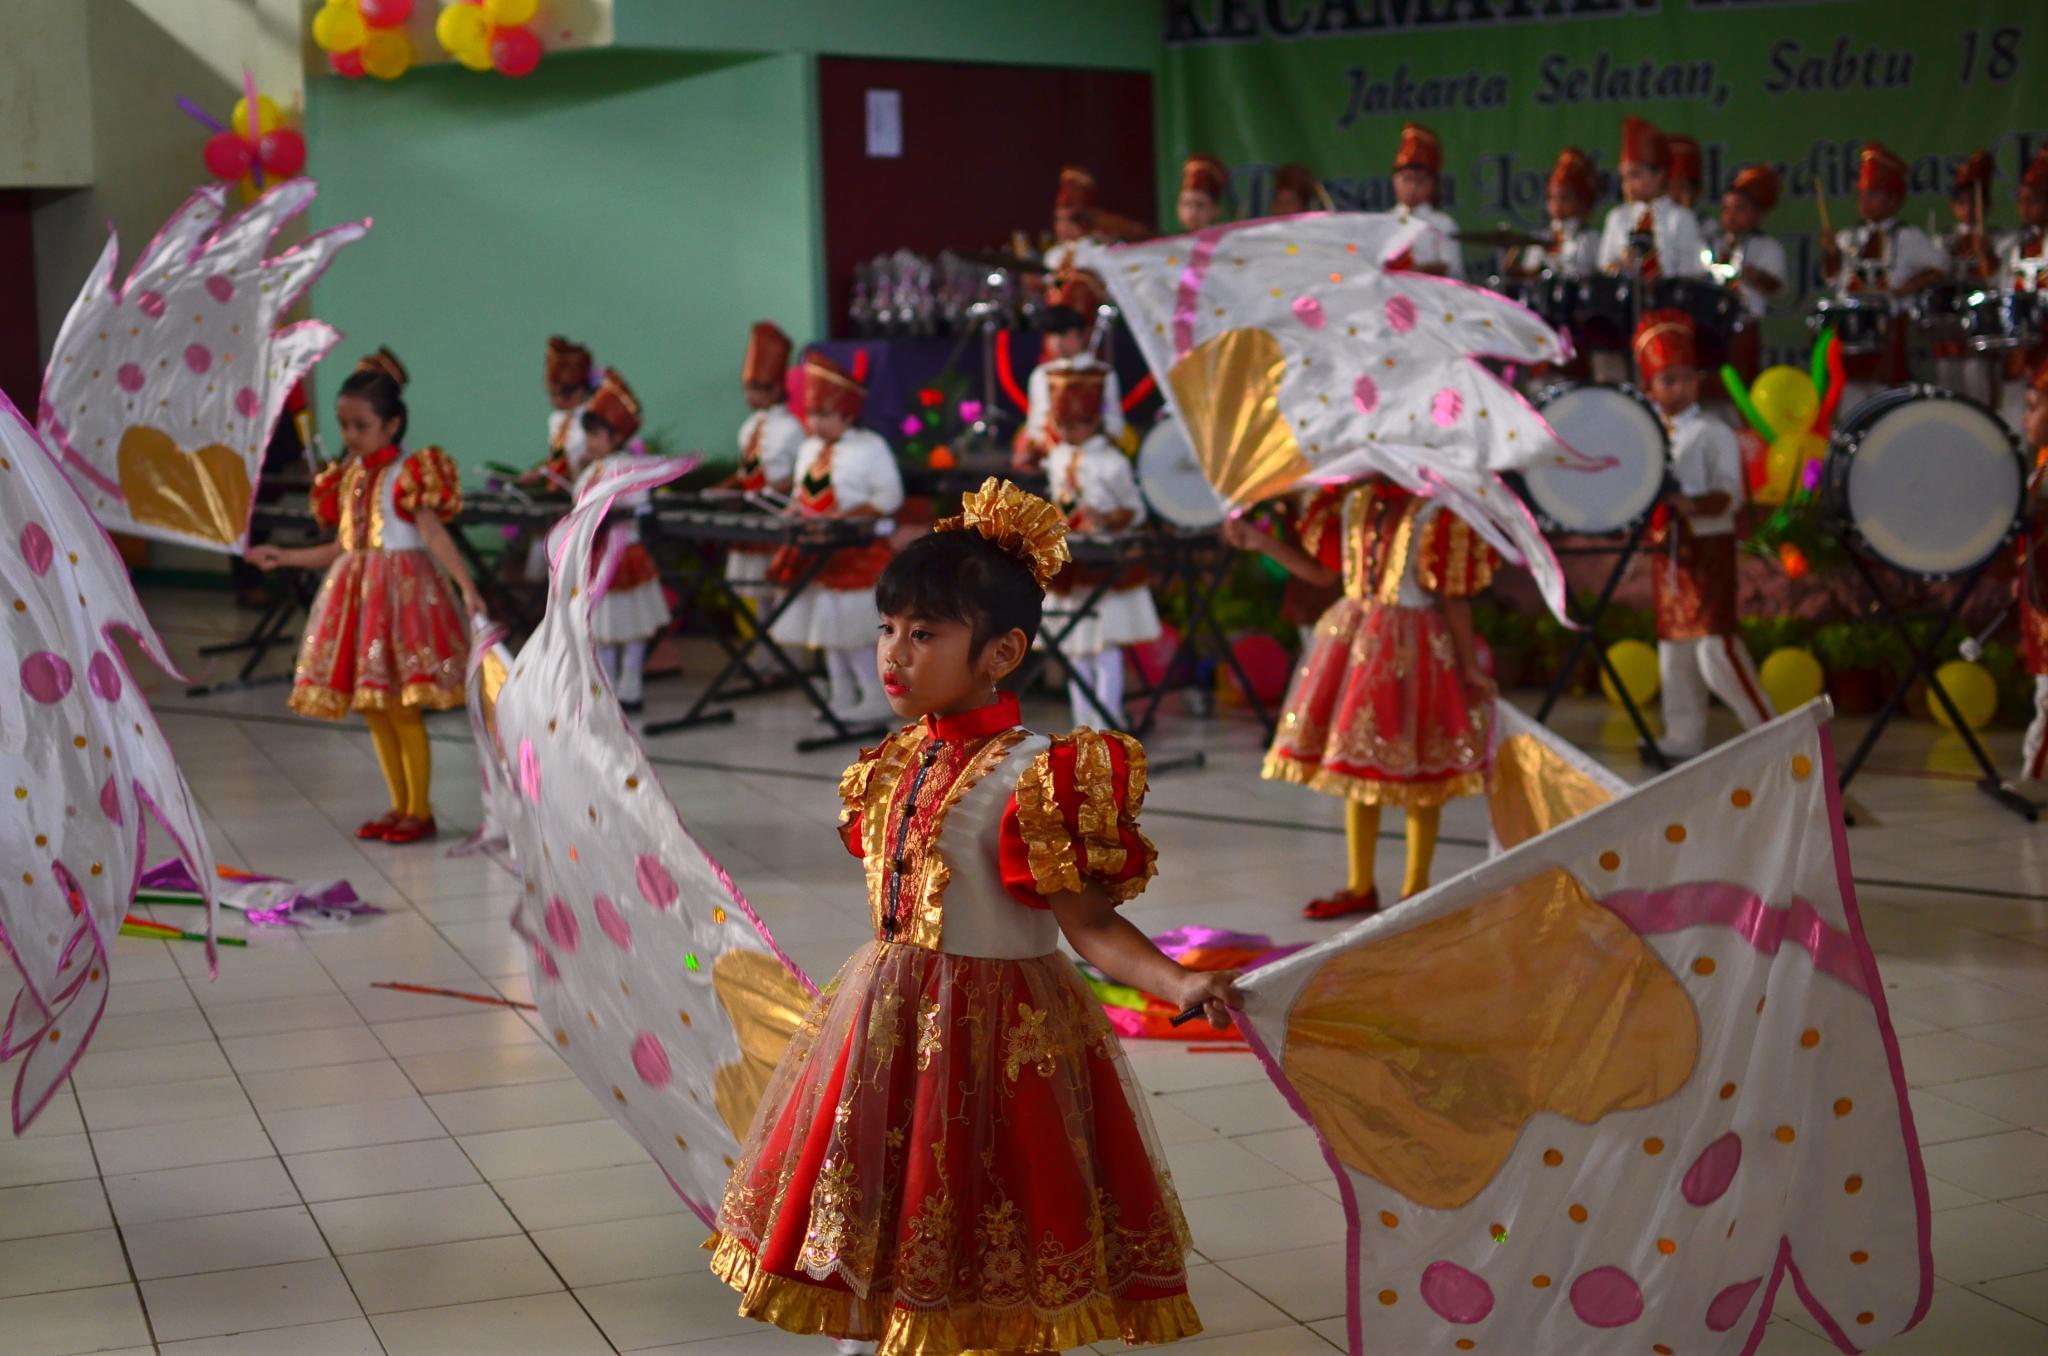 Preschool Marching Band by Yulius